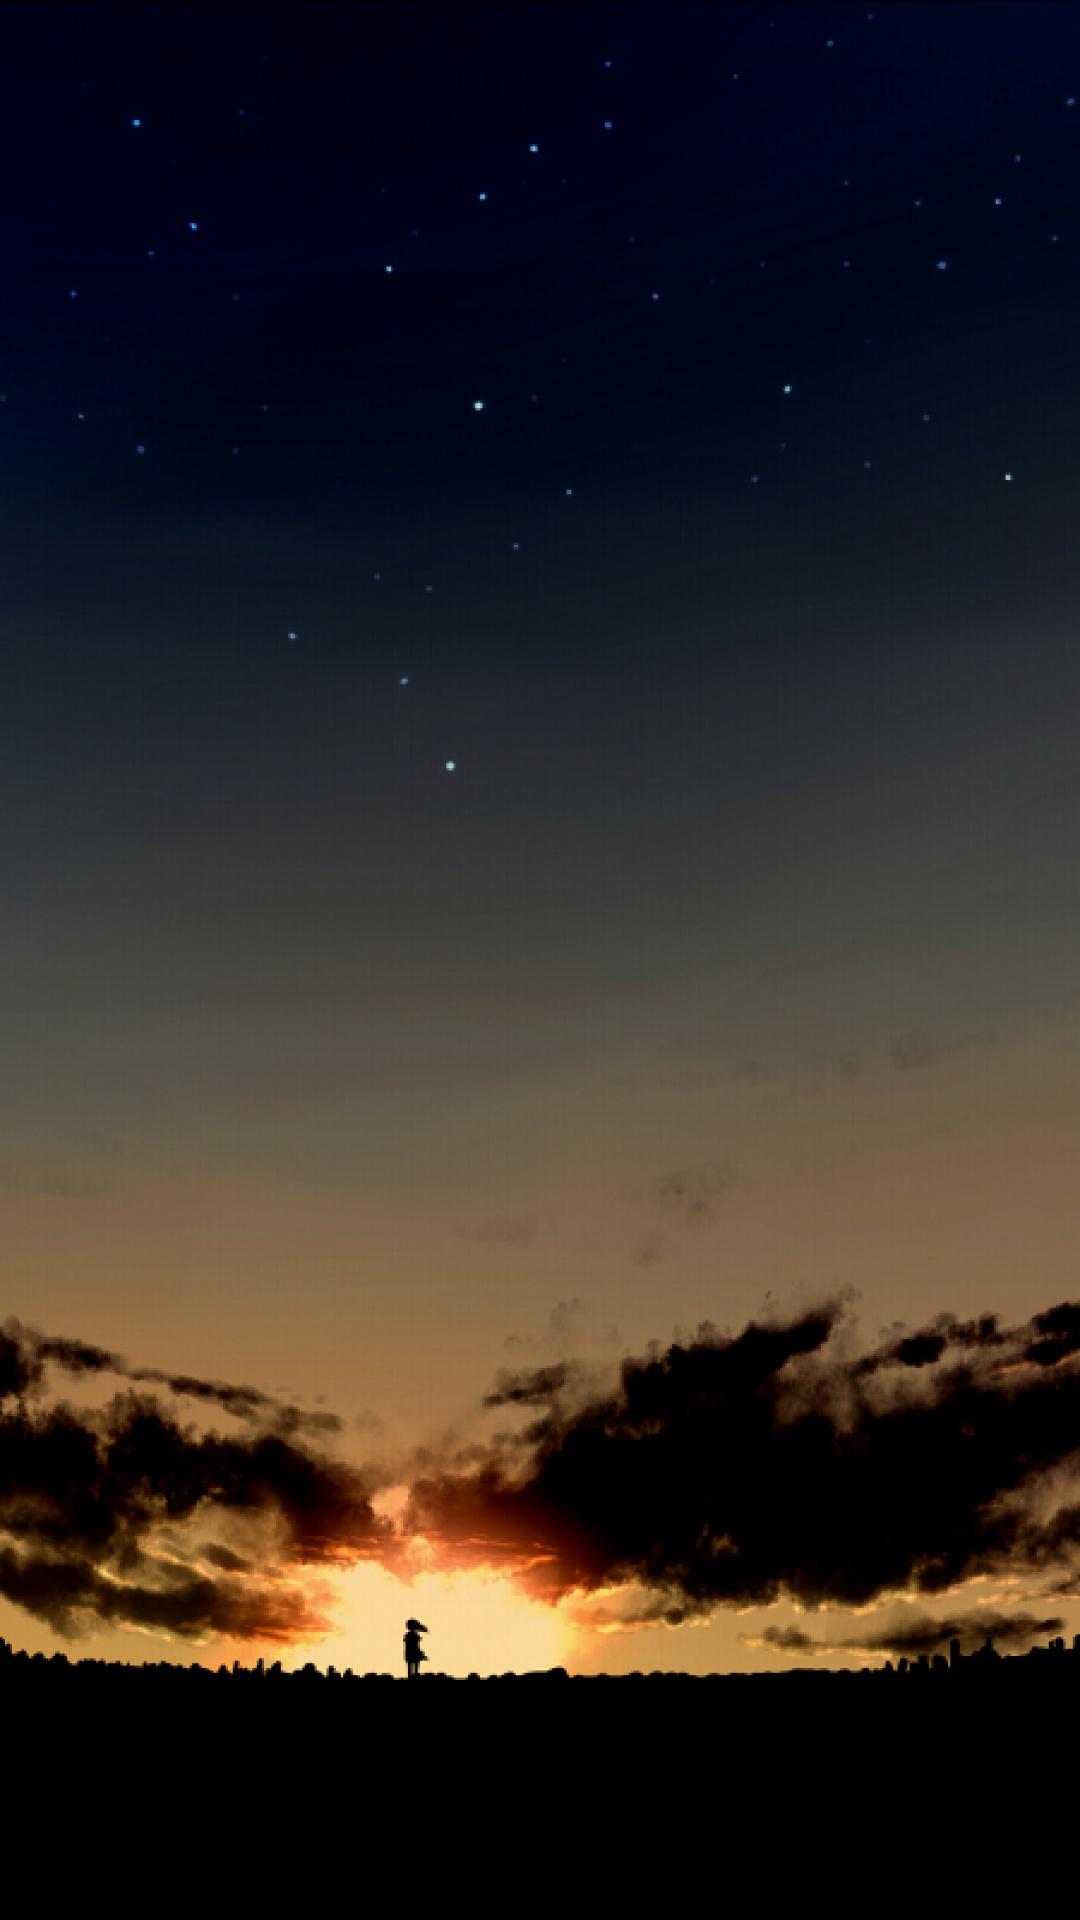 Beautiful Anime Wallpaper Iphone , HD Wallpaper & Backgrounds